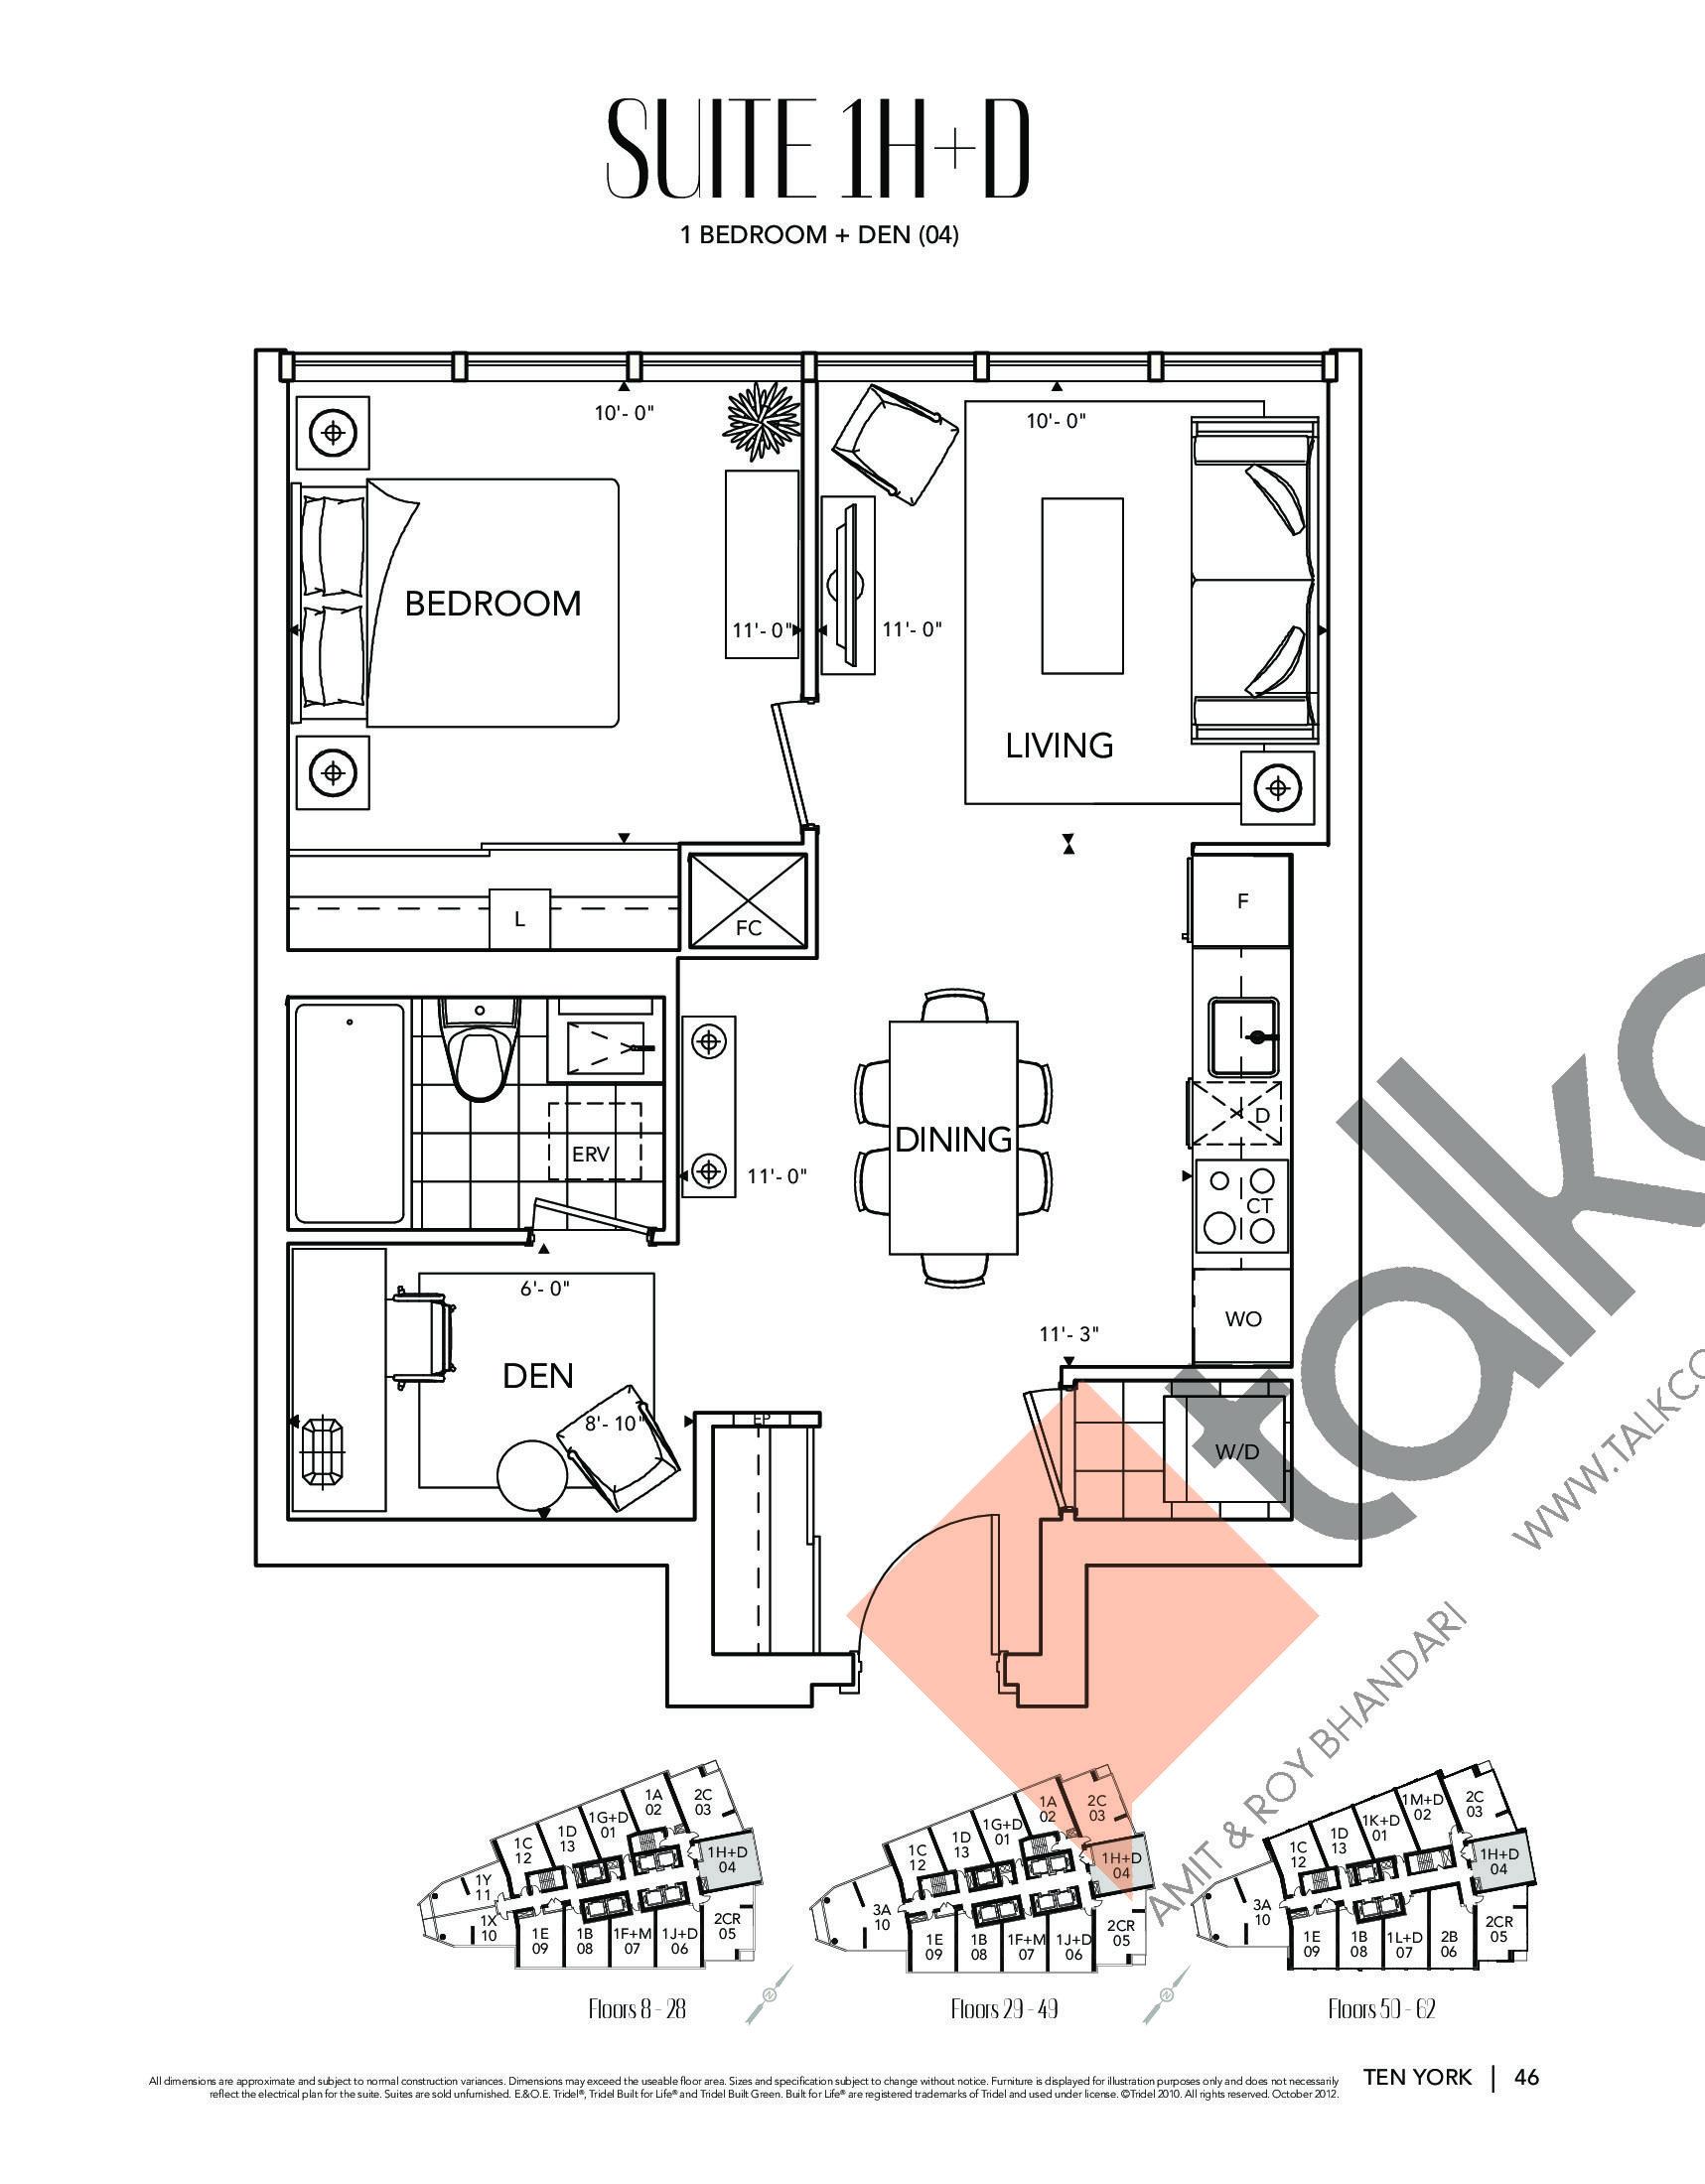 Suite 1H+D Floor Plan at Ten York Condos - 649 sq.ft